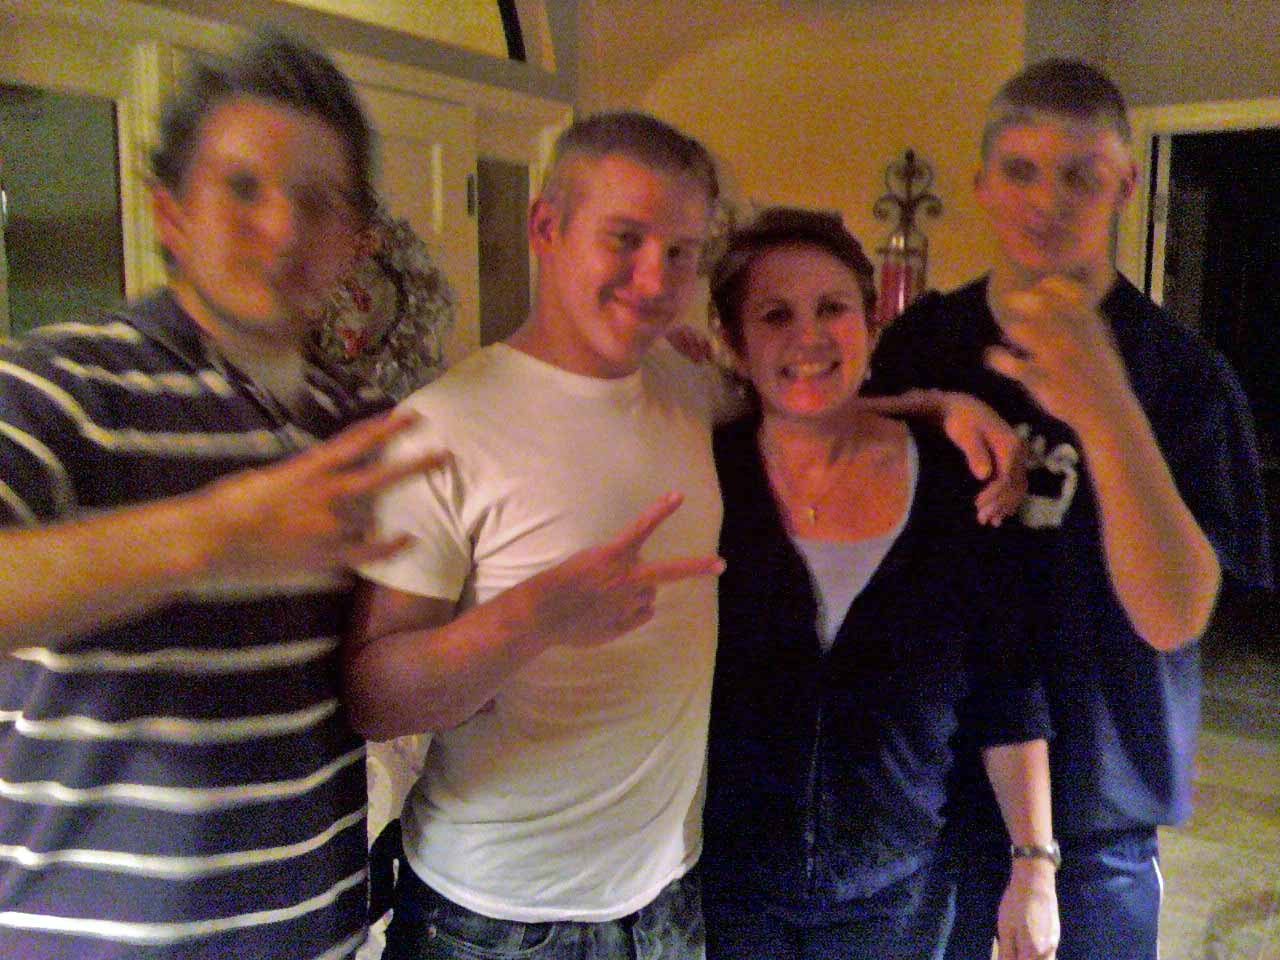 Me and boys